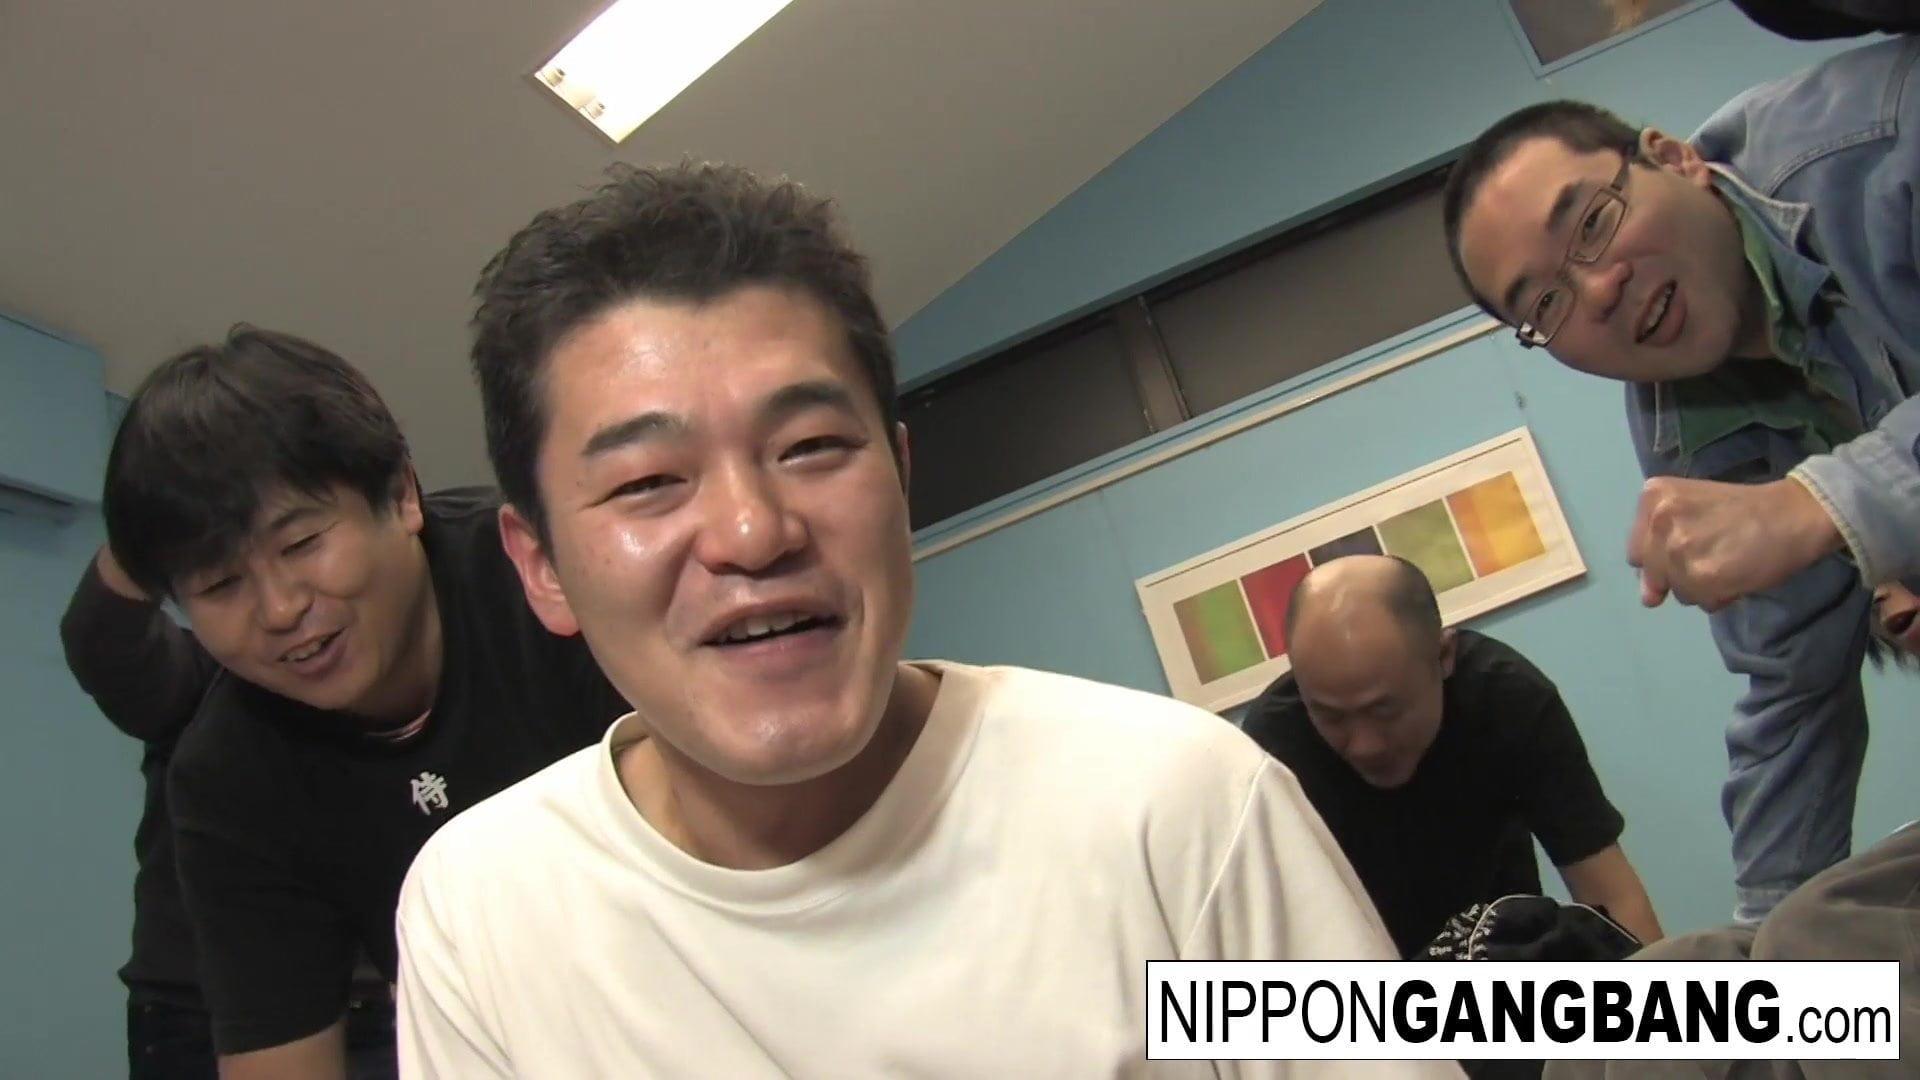 Harajuku hottie will get gangbanged